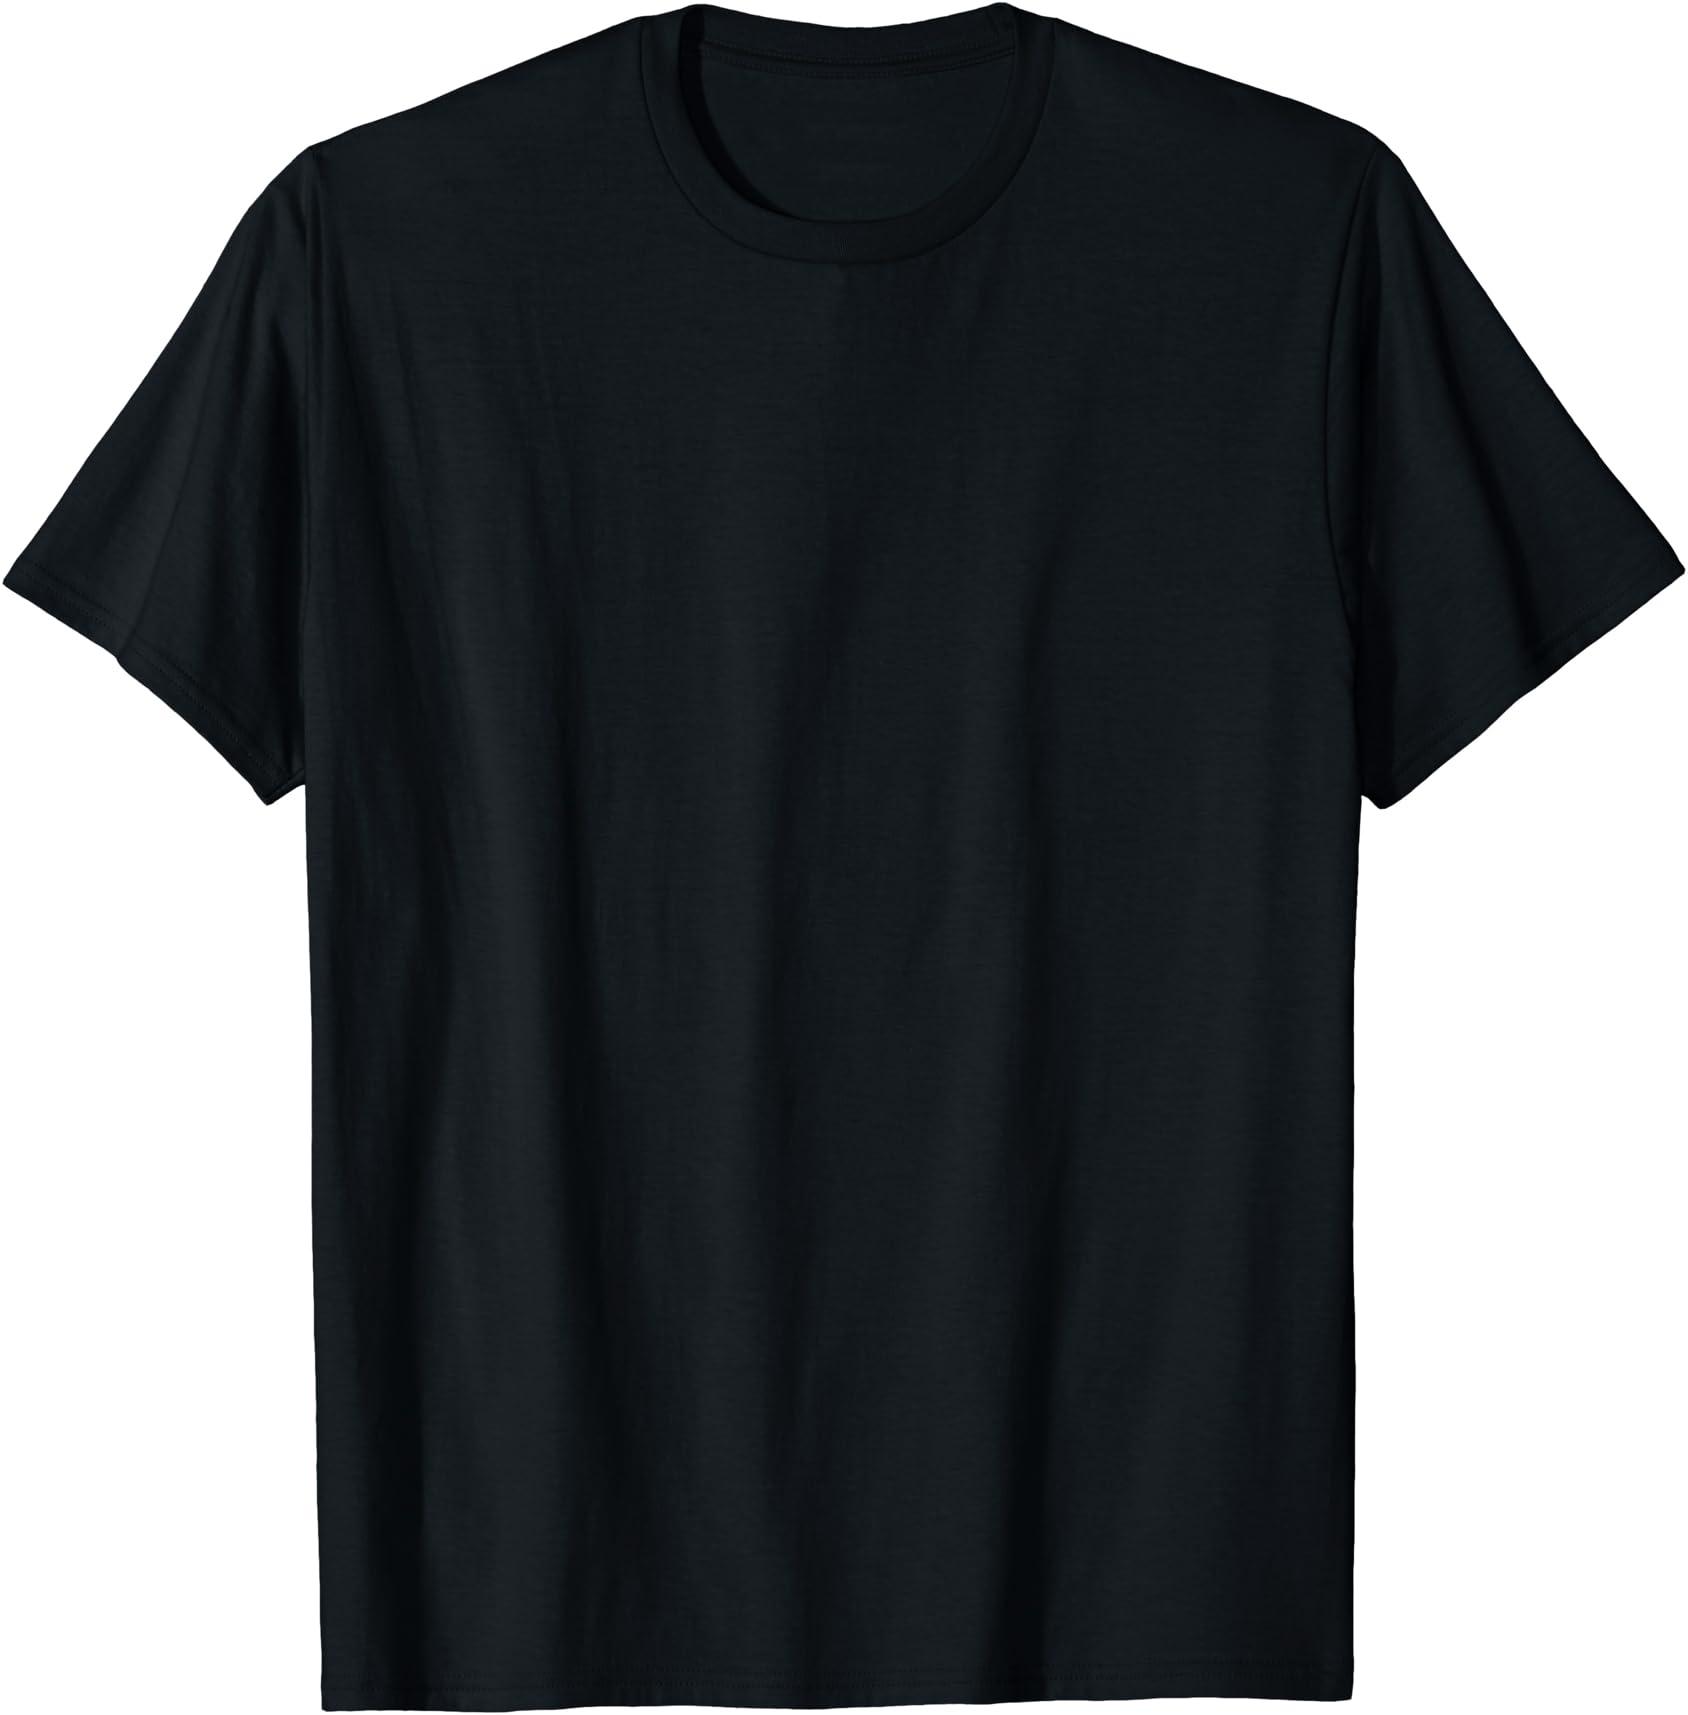 NOT WHITE NOT BLACK JUST BLUES Mens T-Shirt Music Trumpet Guitar Novelty